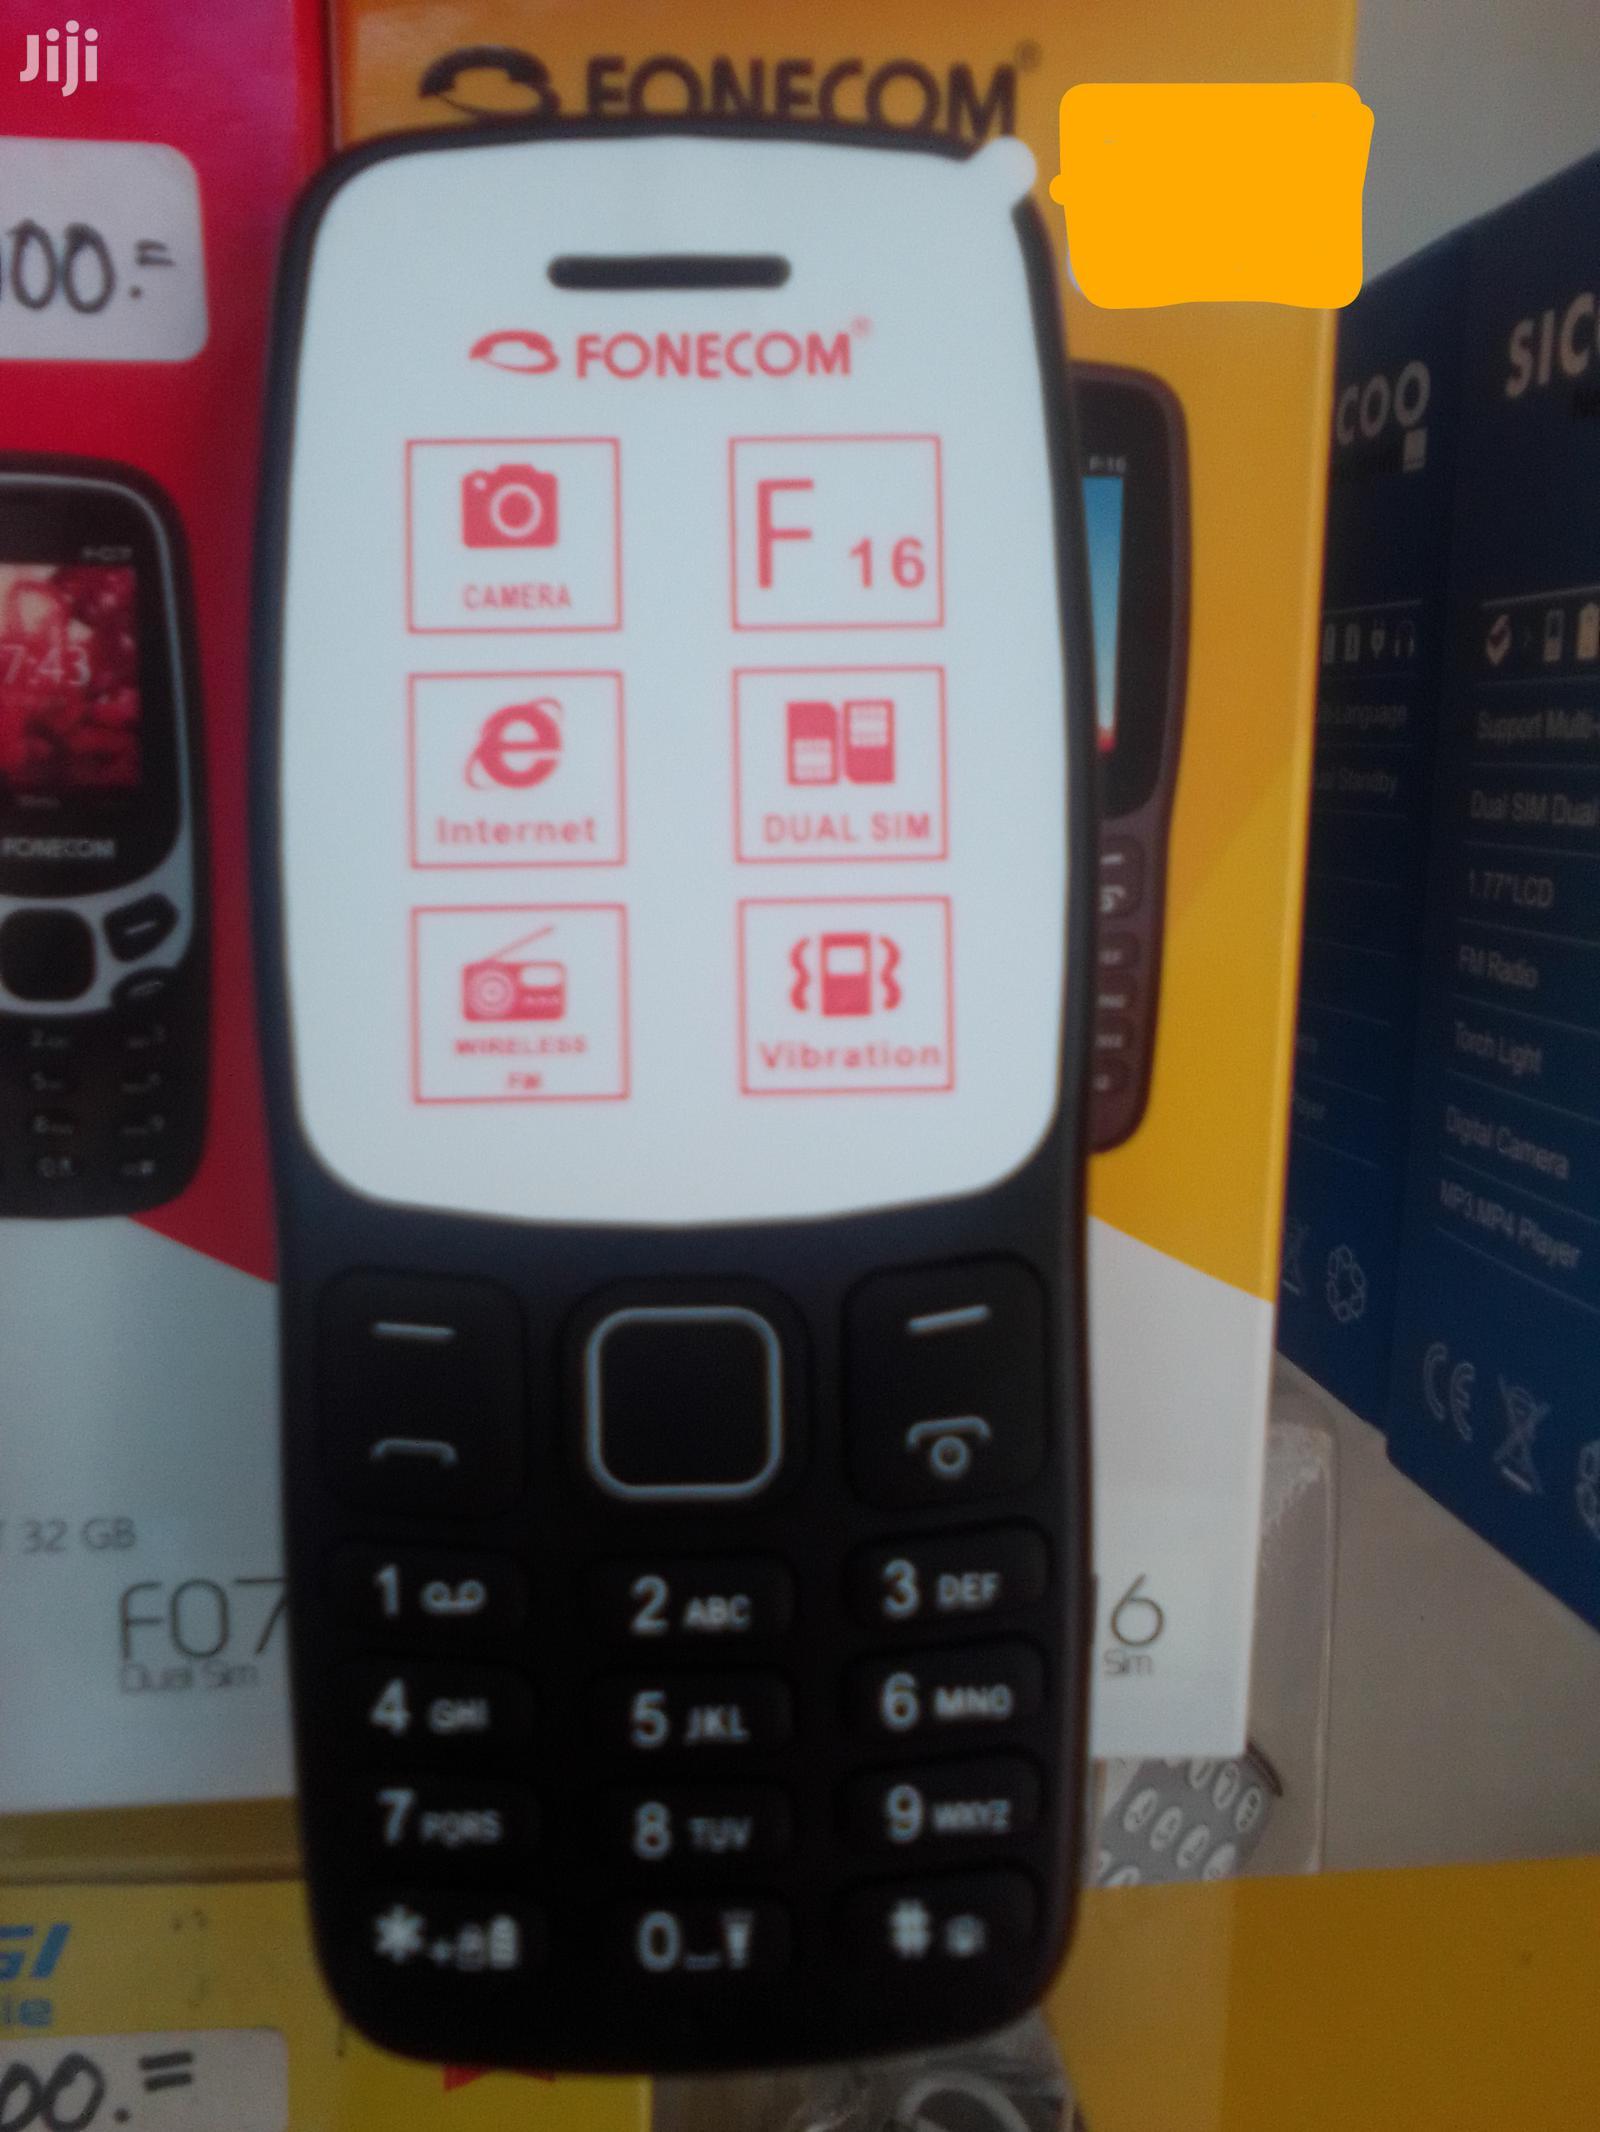 New Mobile Phone Black | Mobile Phones for sale in Tononoka, Mombasa, Kenya